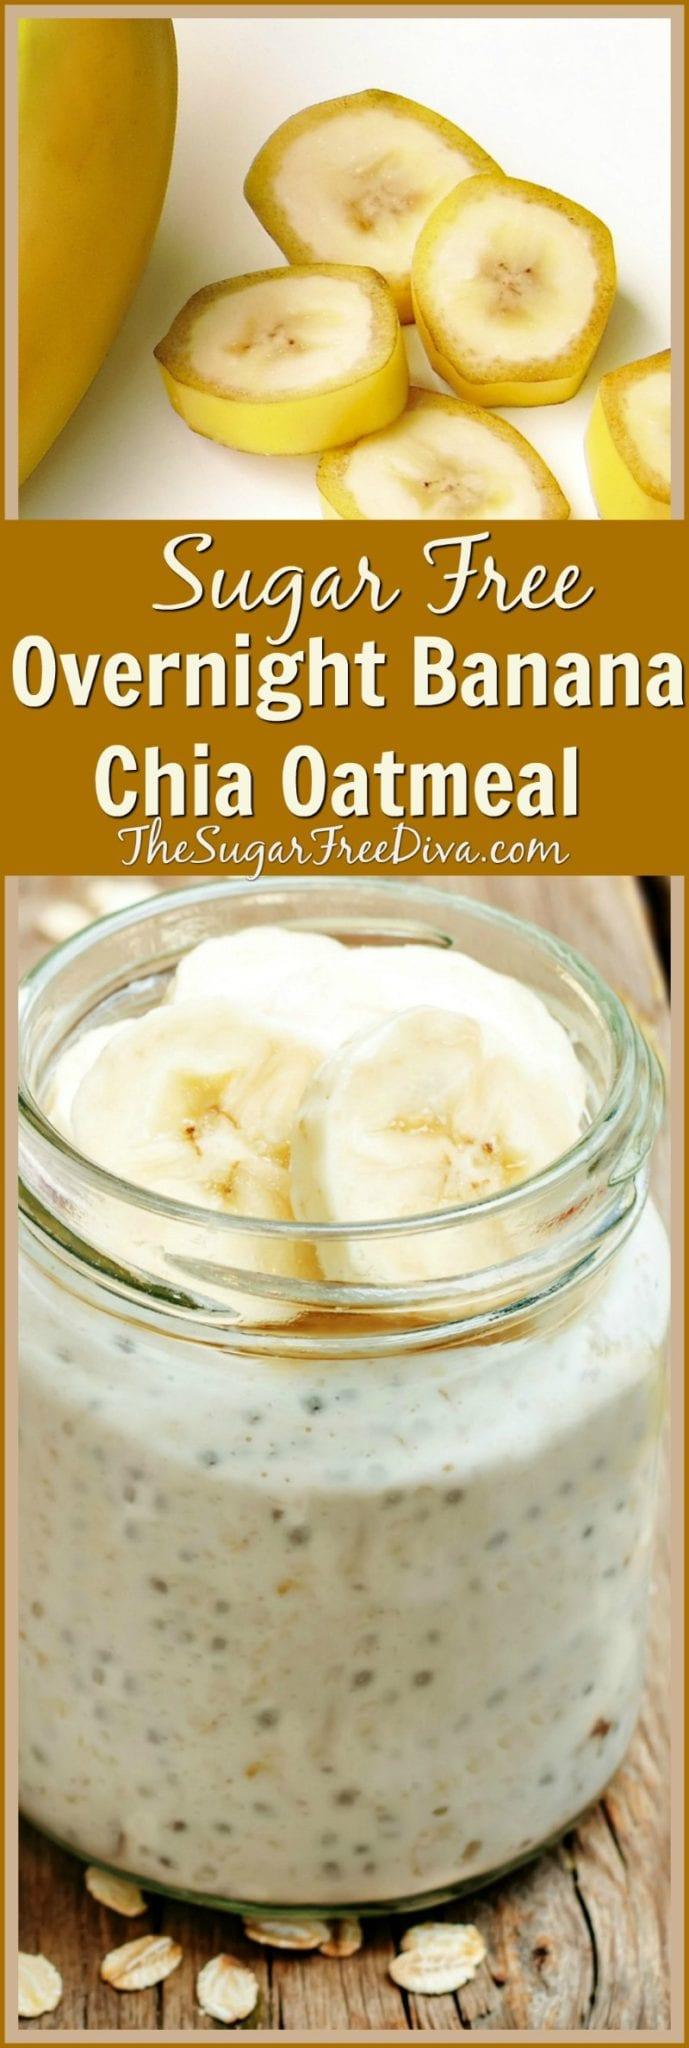 Sugar Free Overnight Banana Chia Oatmeal - THE SUGAR FREE DIVA